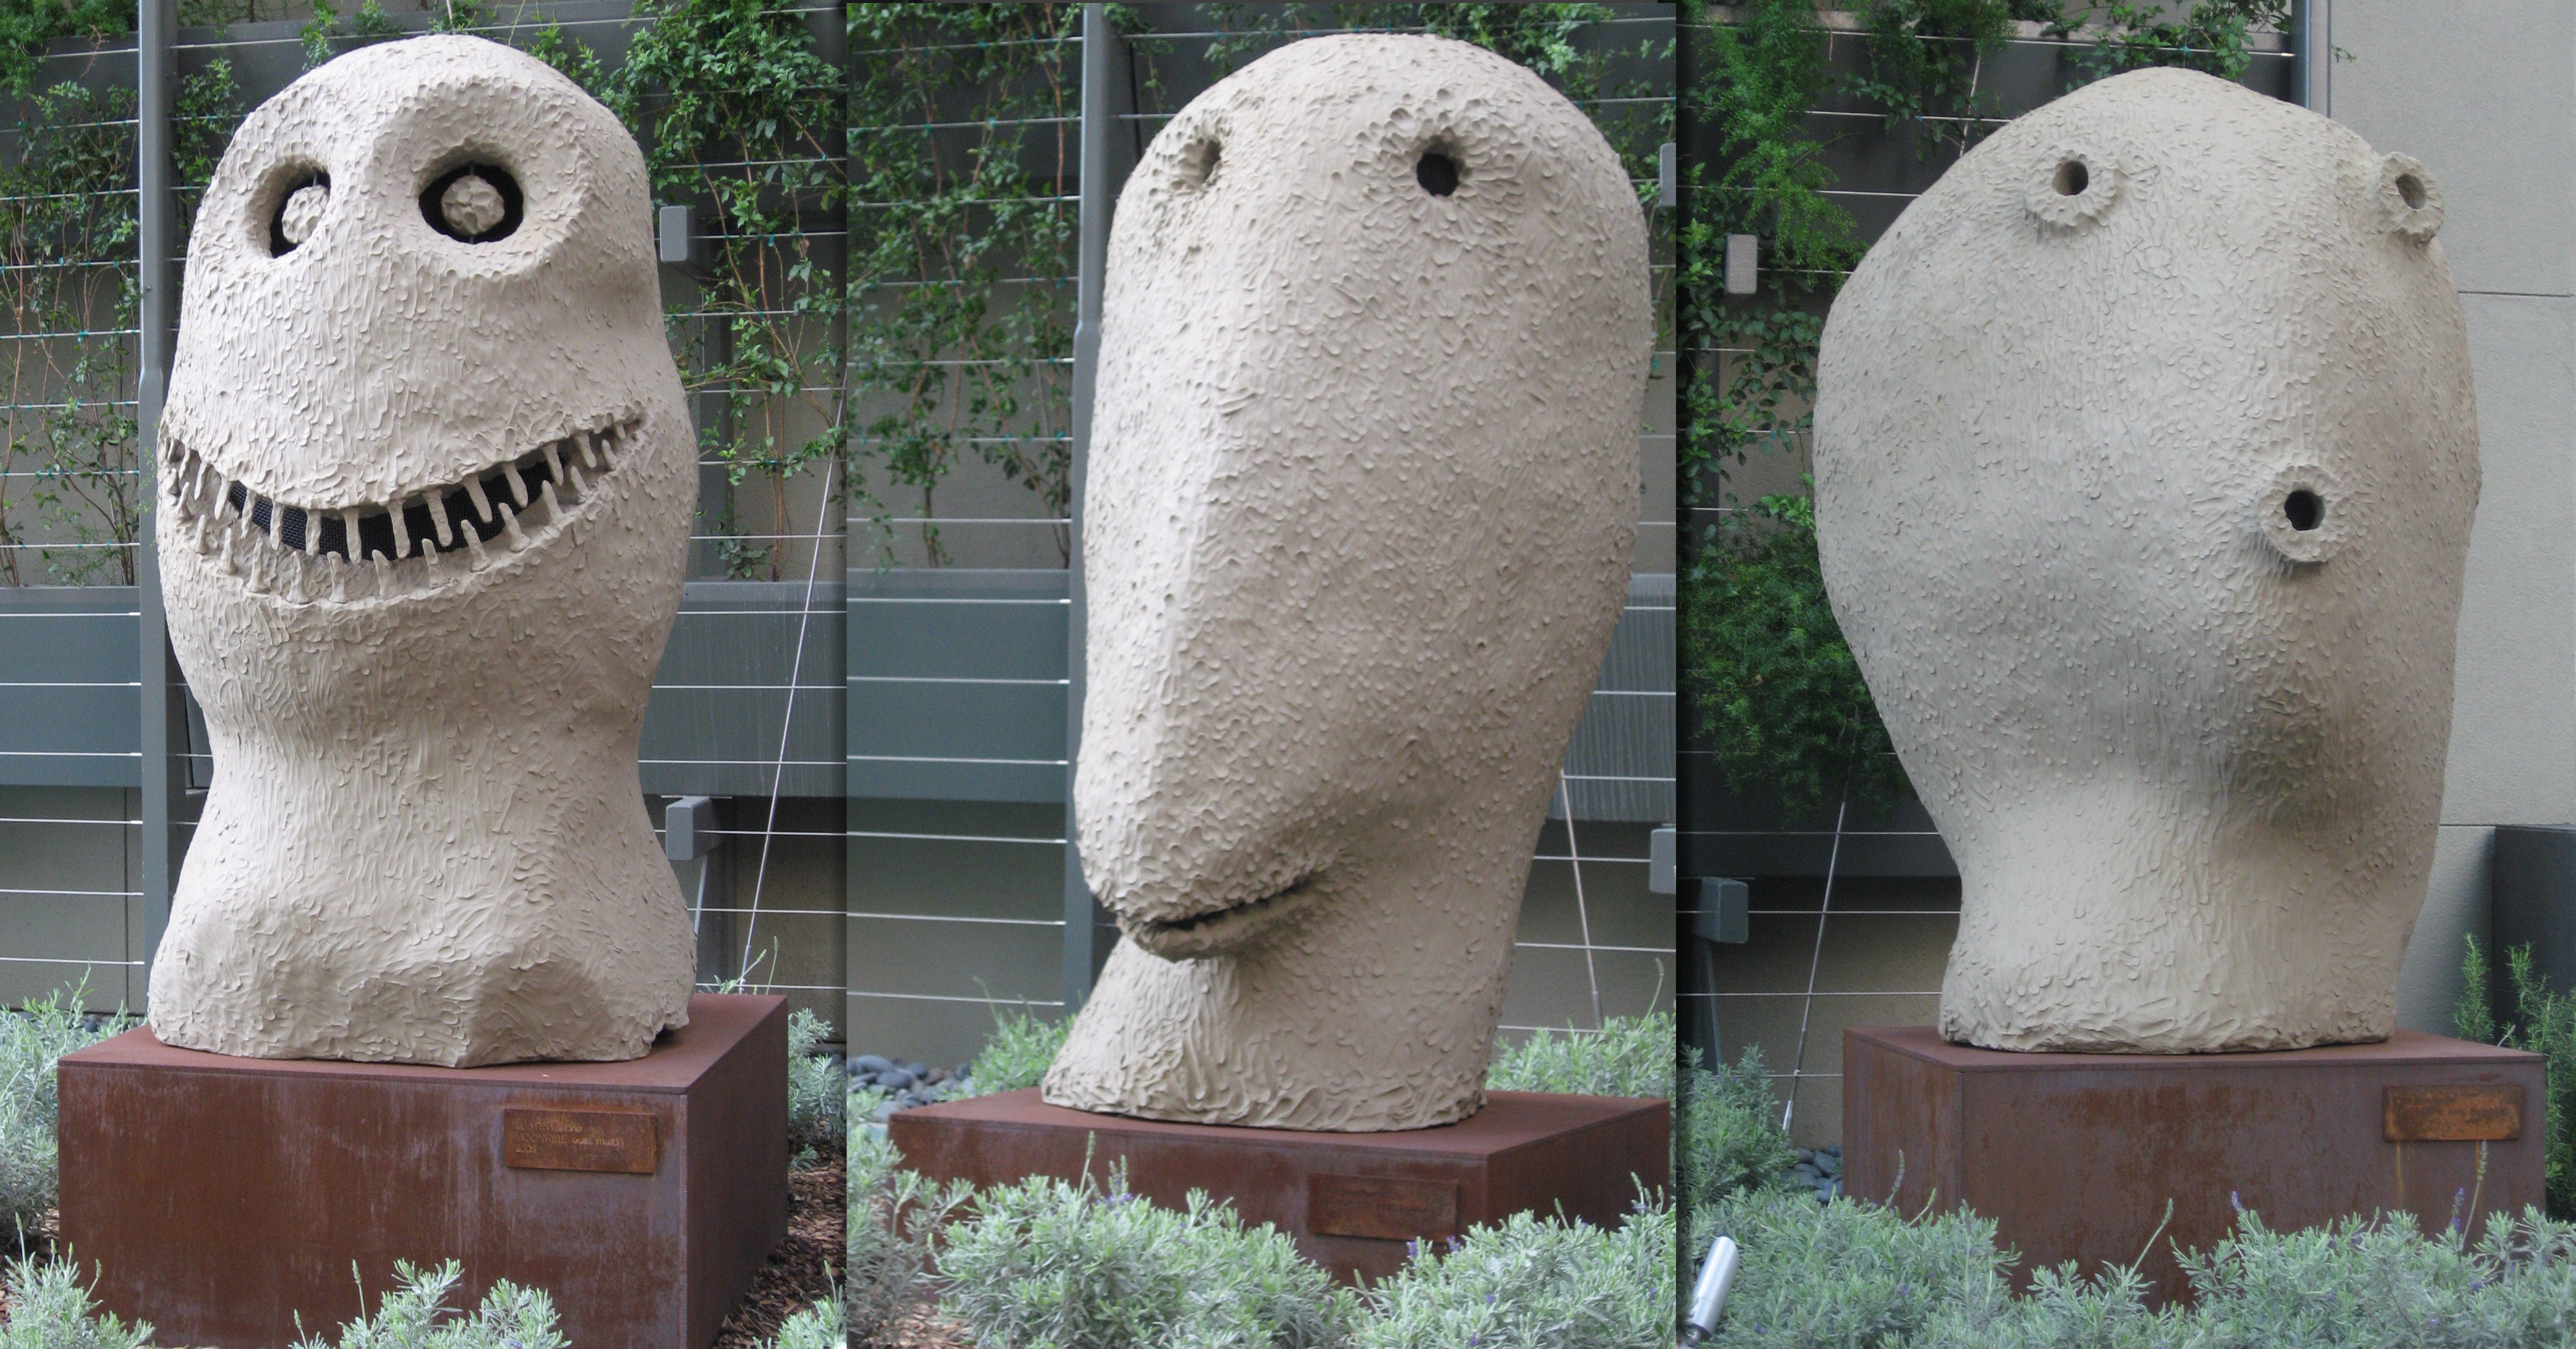 Moonrise Sculptures by Ugo Rondinone